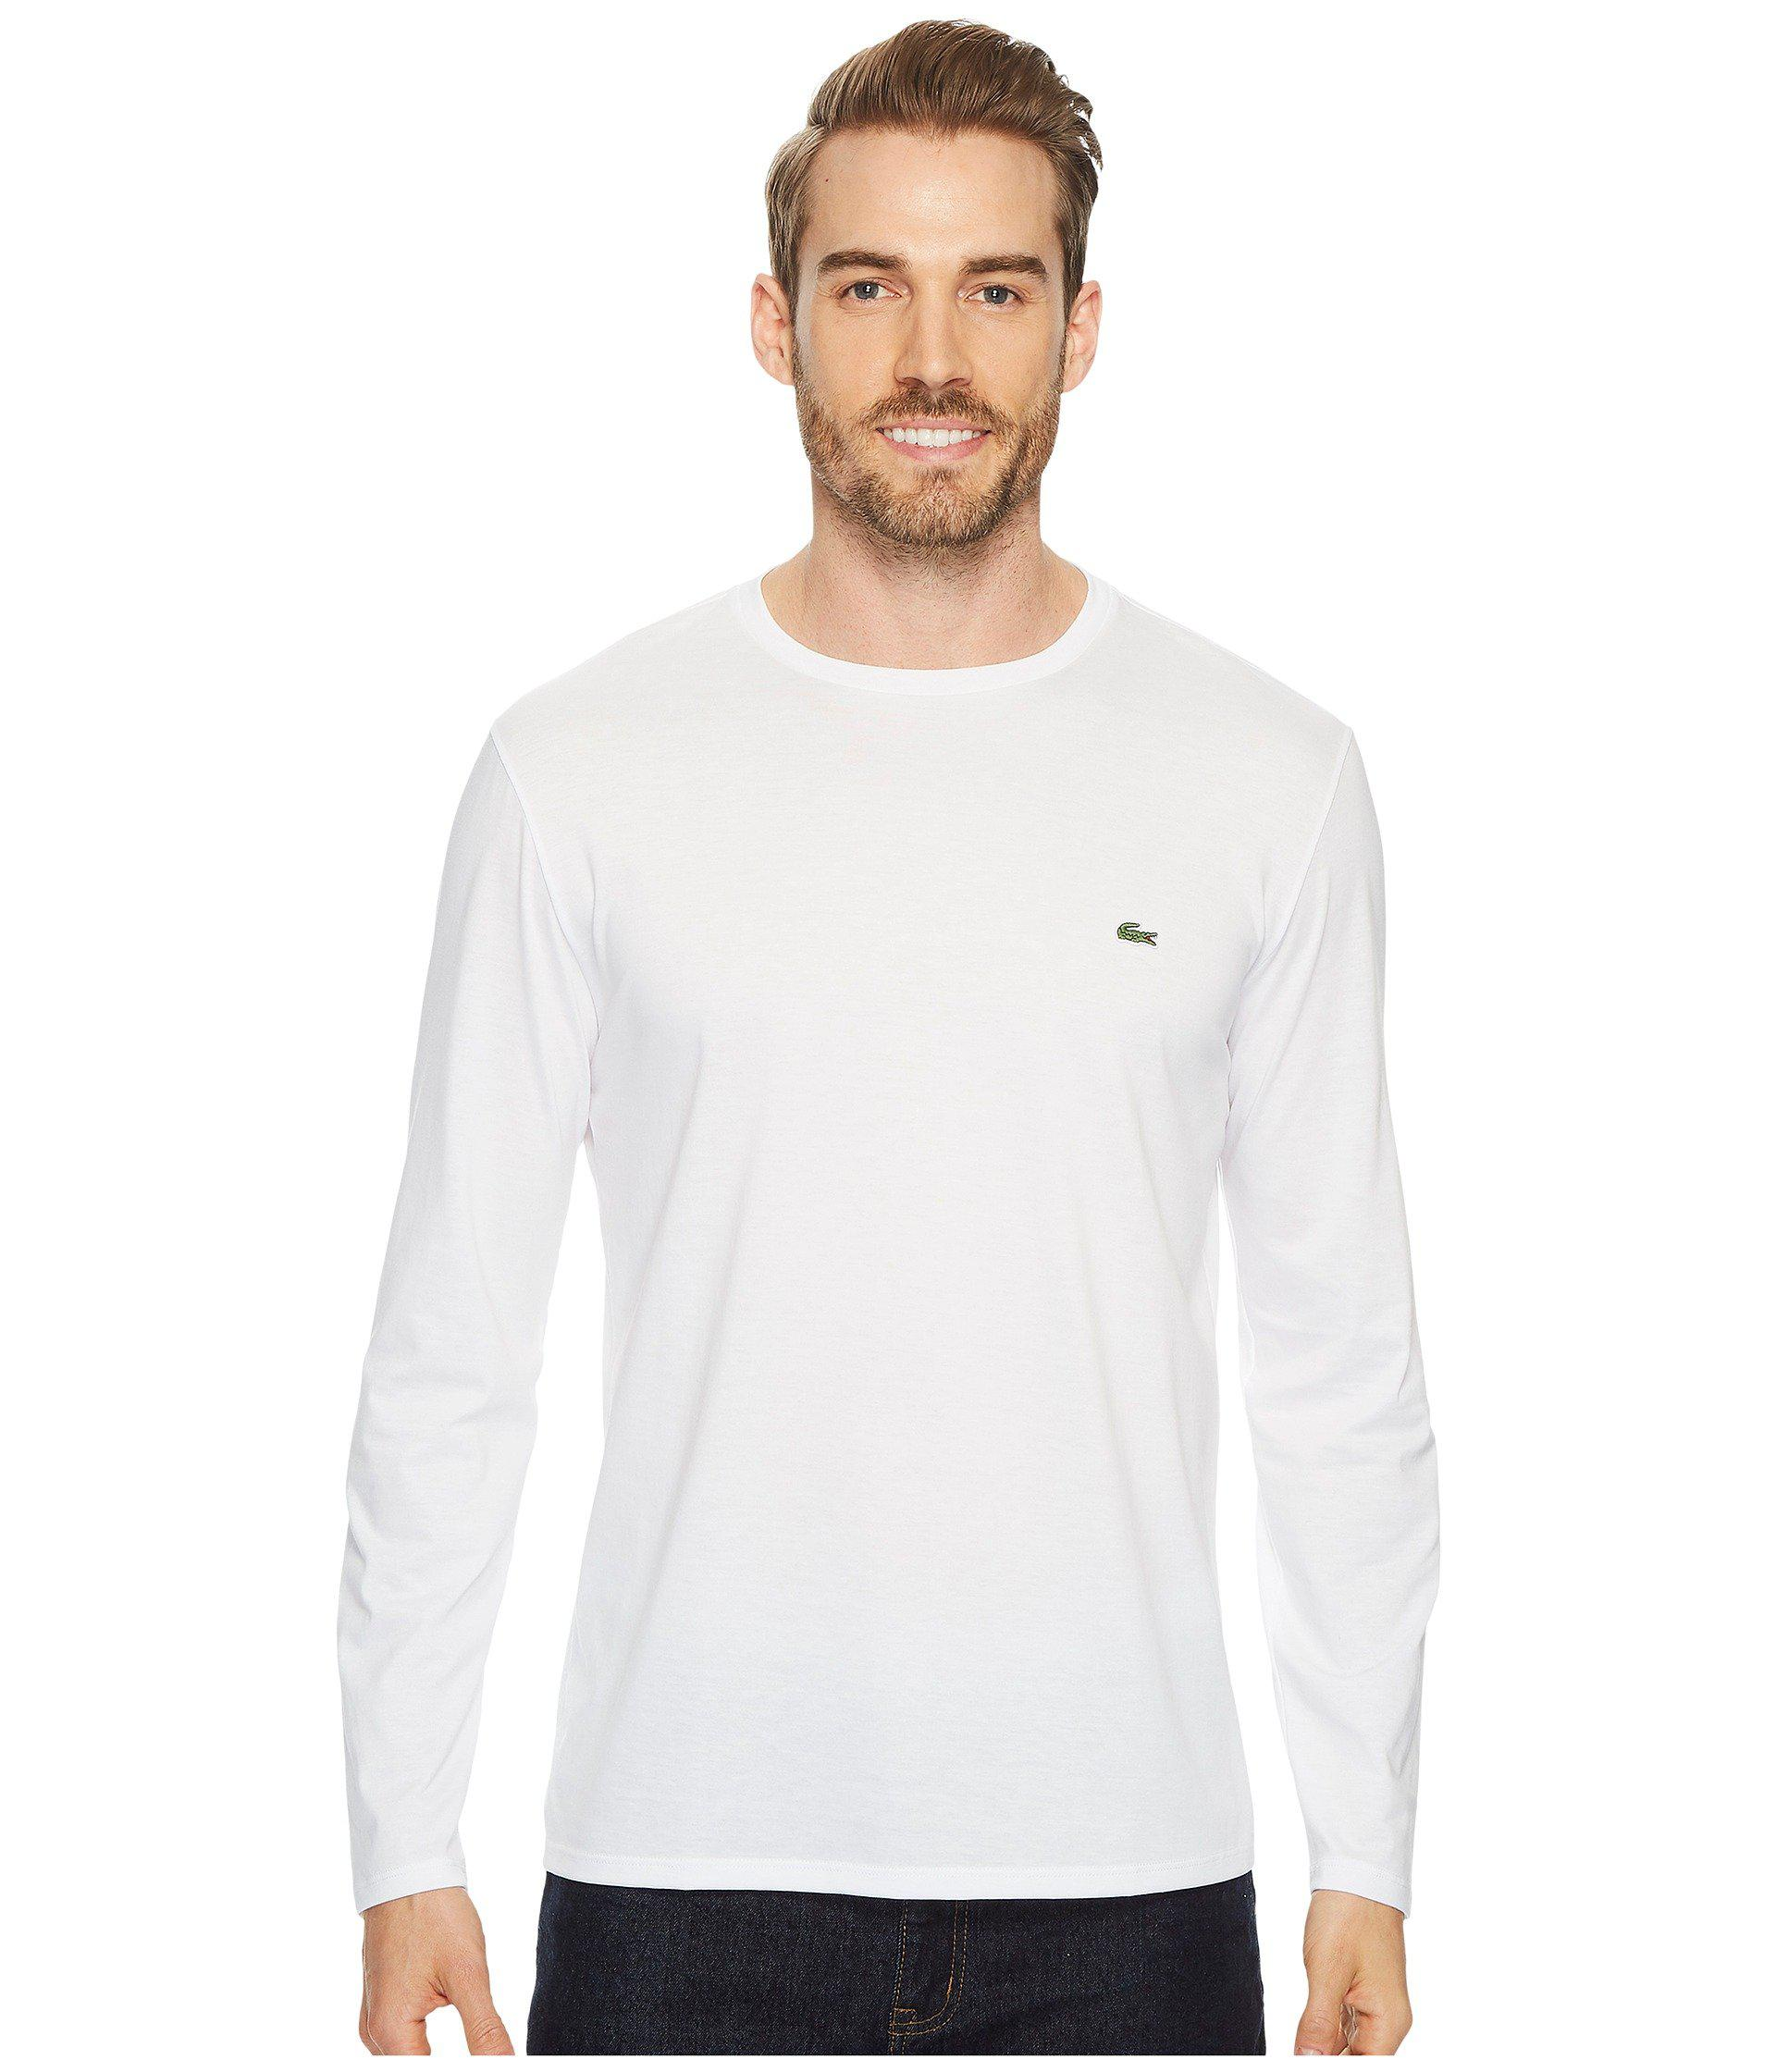 d73d06fba1 Lacoste Shirt Long Sleeve V Neck T Shirt   Azərbaycan Dillər ...